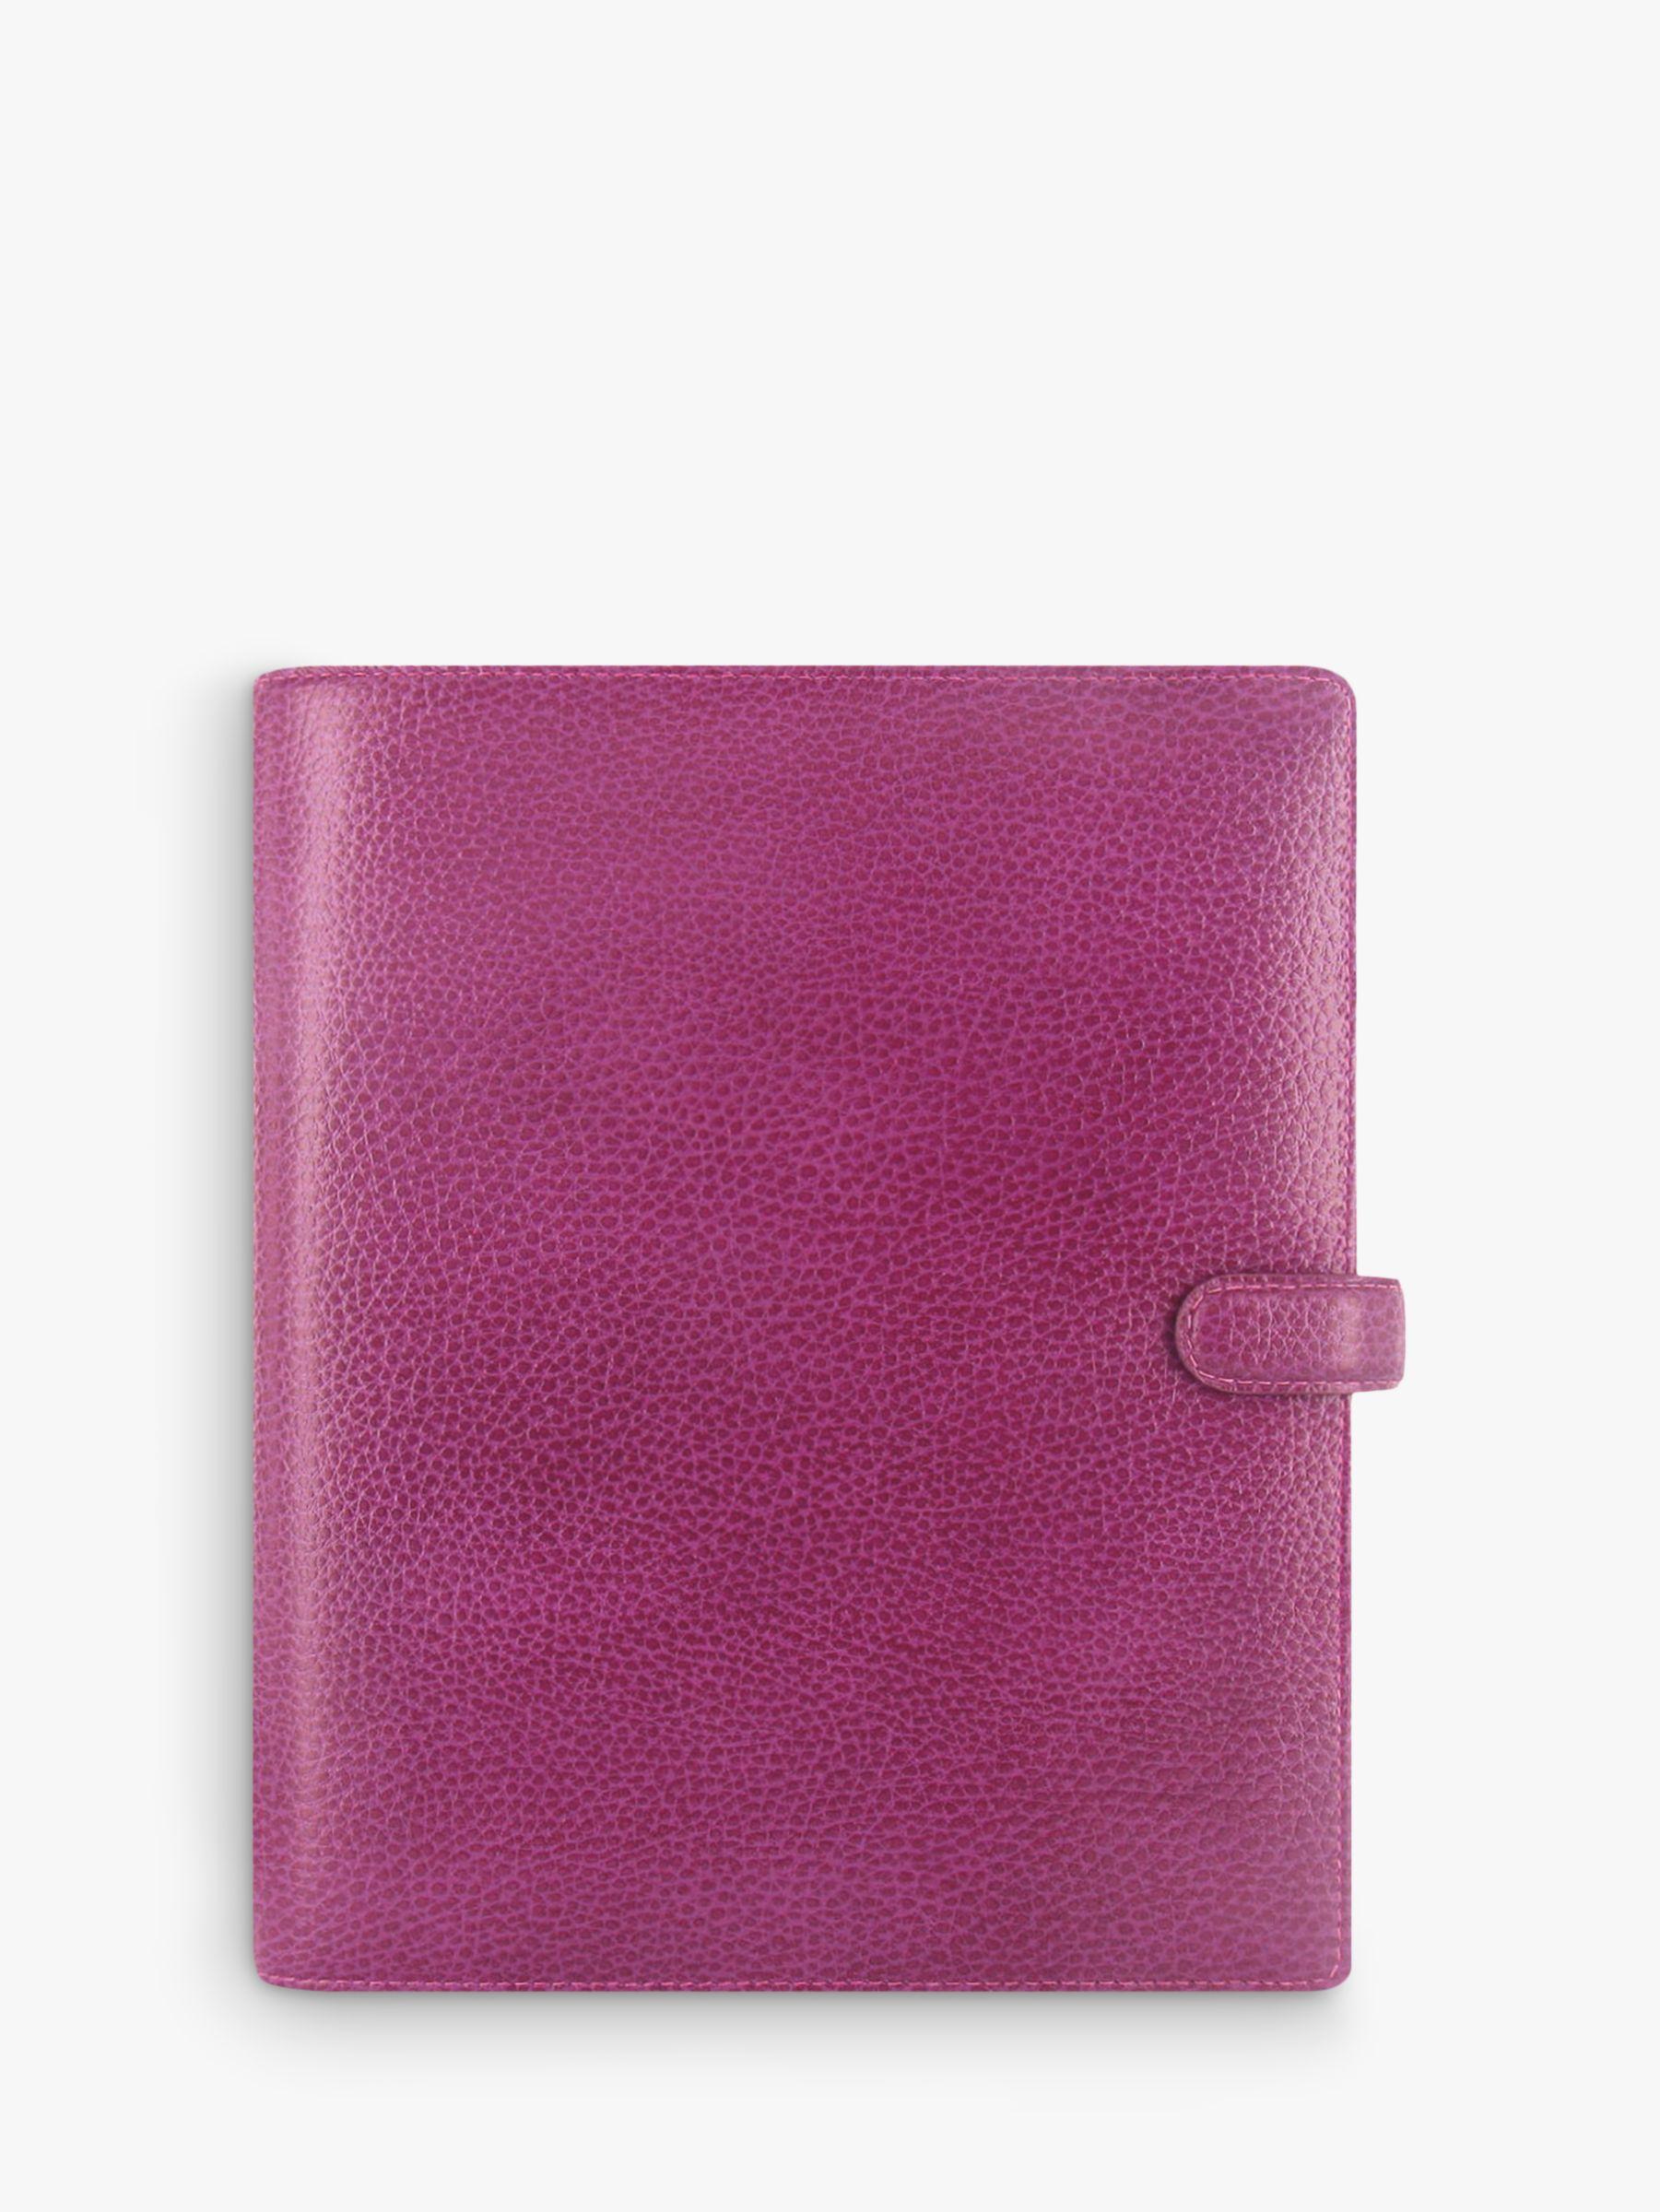 Filofax Filofax Finsbury Leather A5 Organiser, Raspberry